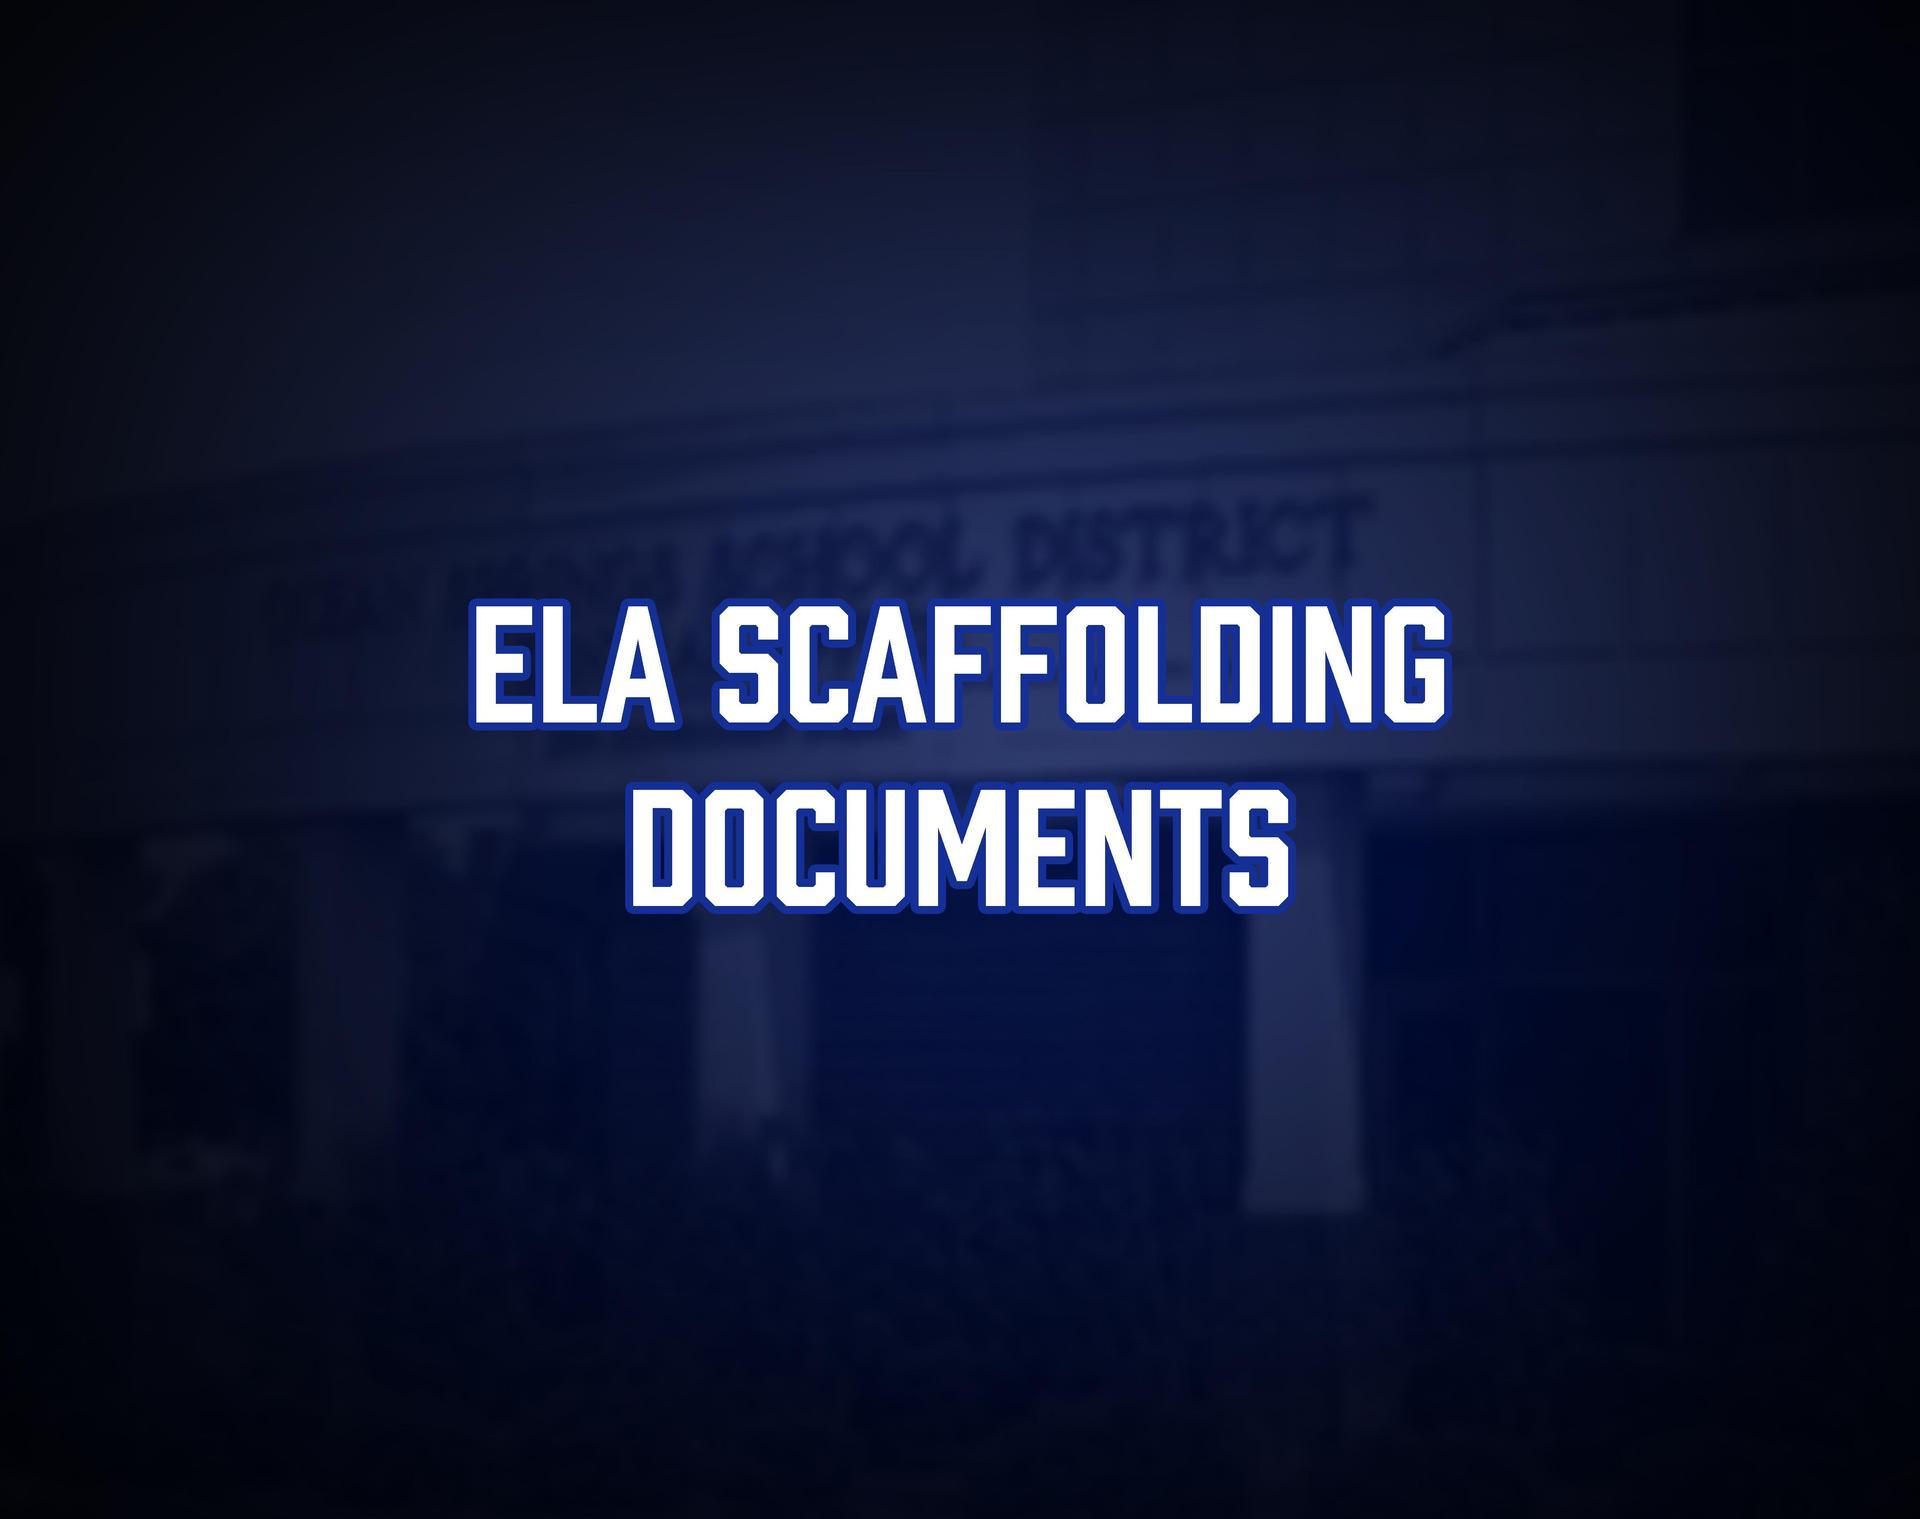 ELA Scaffolding Documents